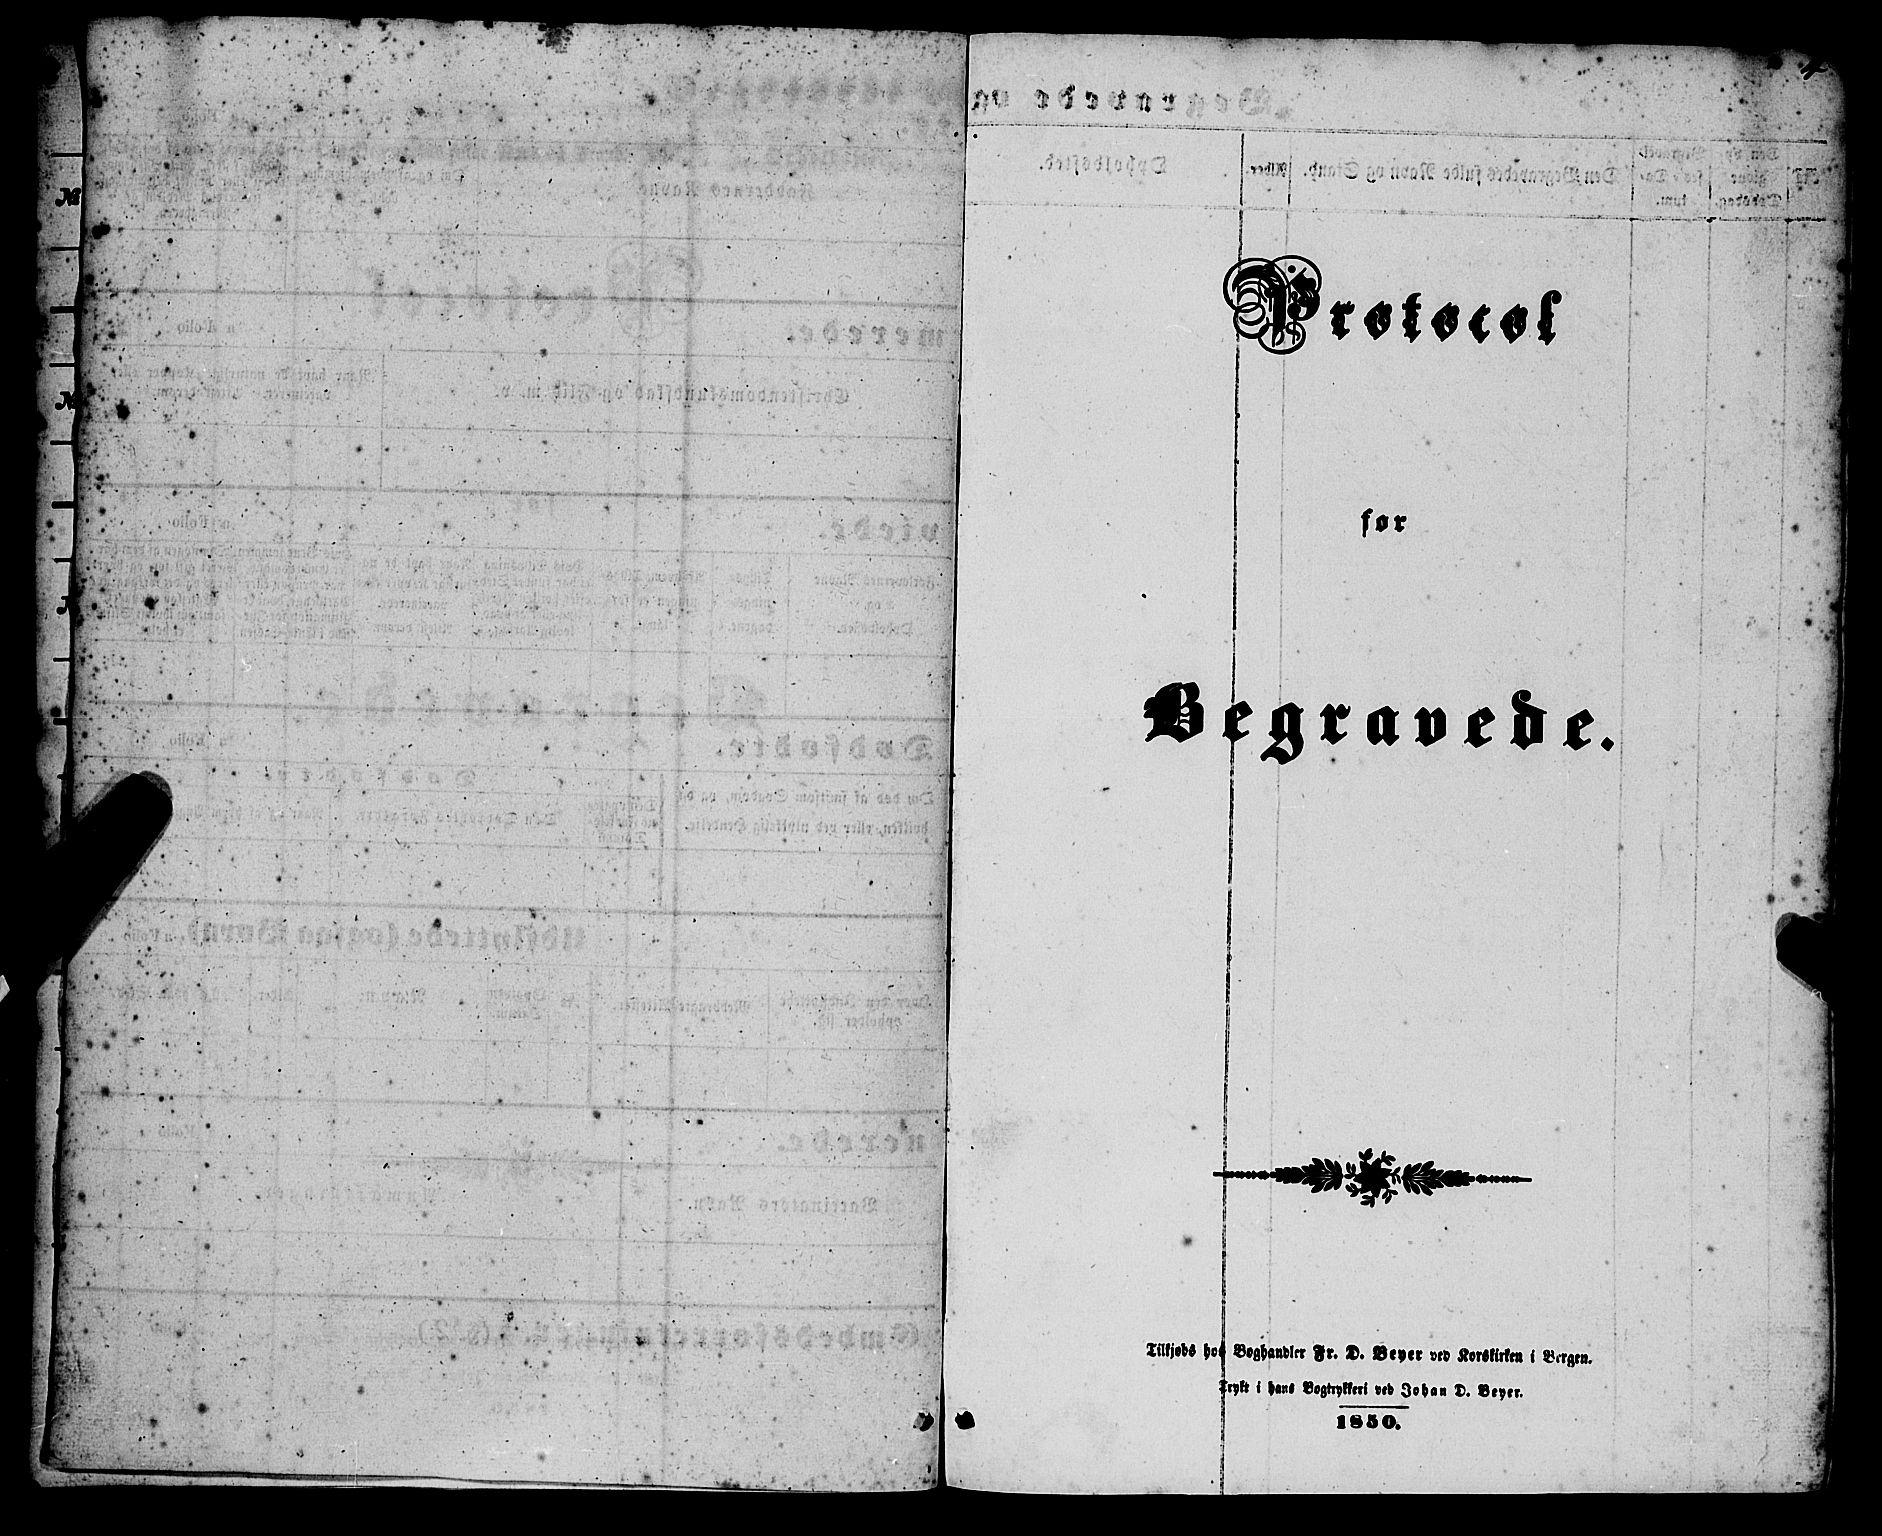 SAB, Nykirken Sokneprestembete, H/Haa/L0042: Ministerialbok nr. E 2, 1850-1868, s. 4